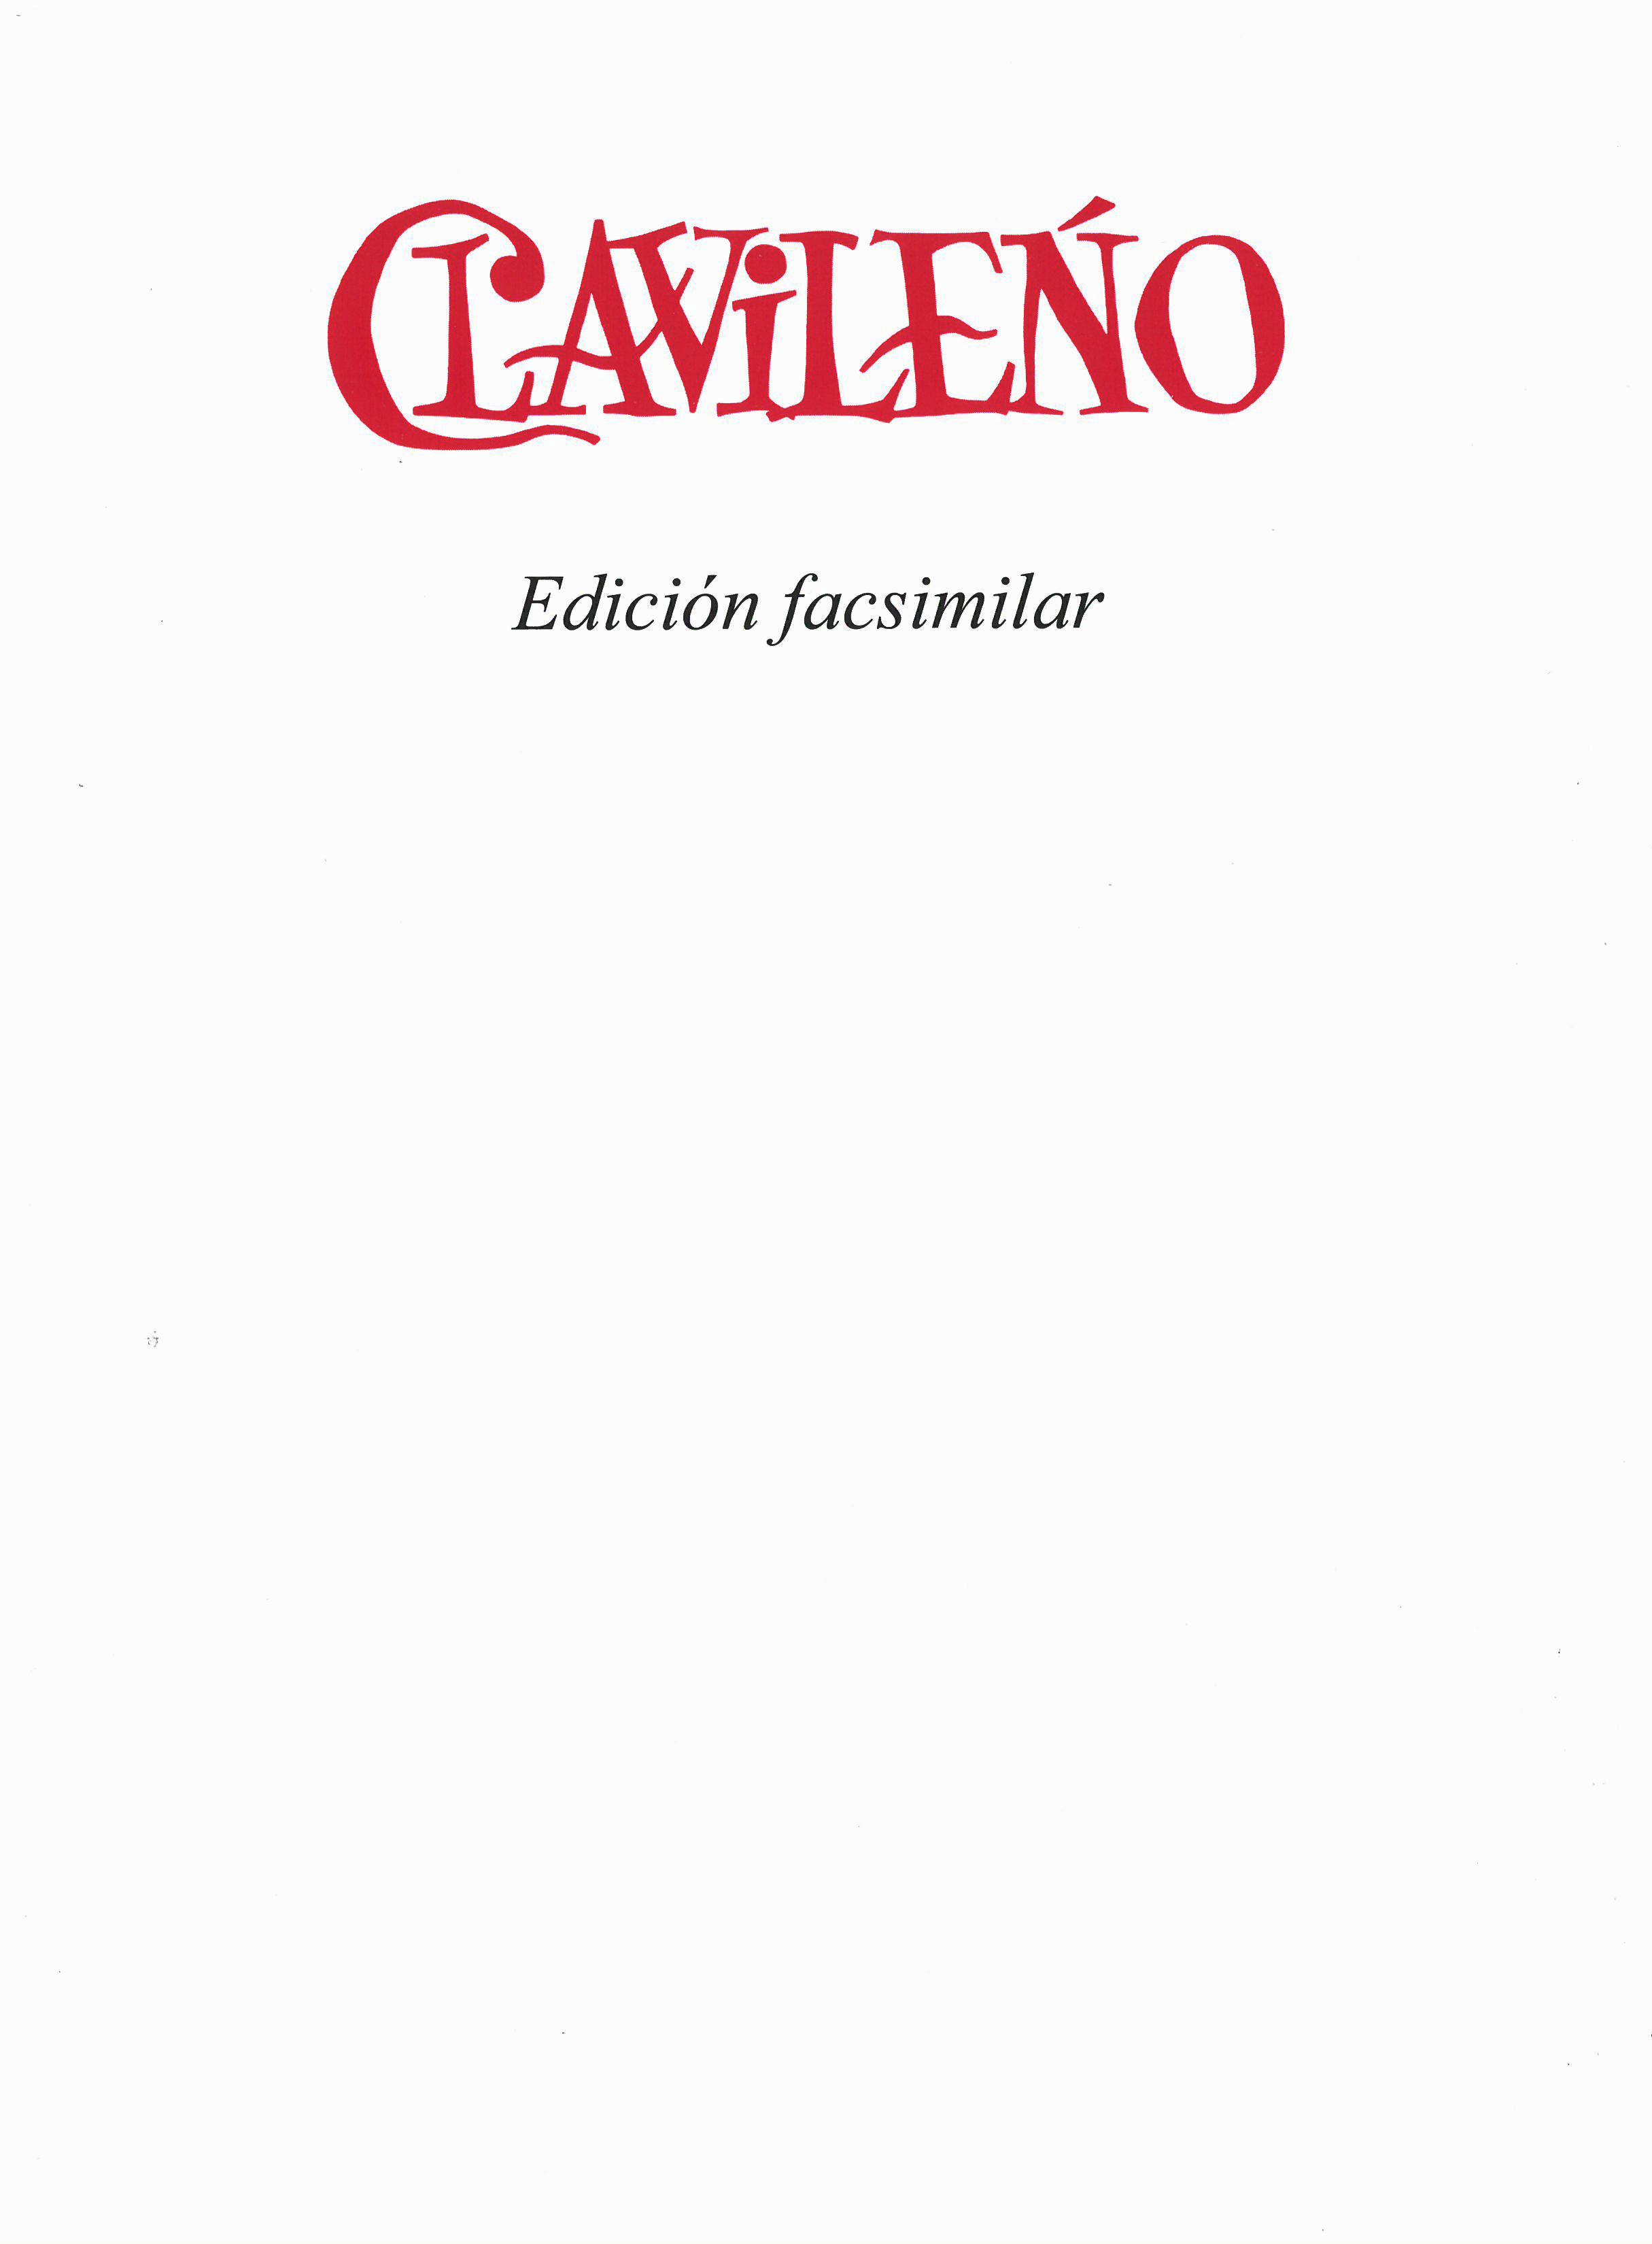 CLAVILEÑO Image